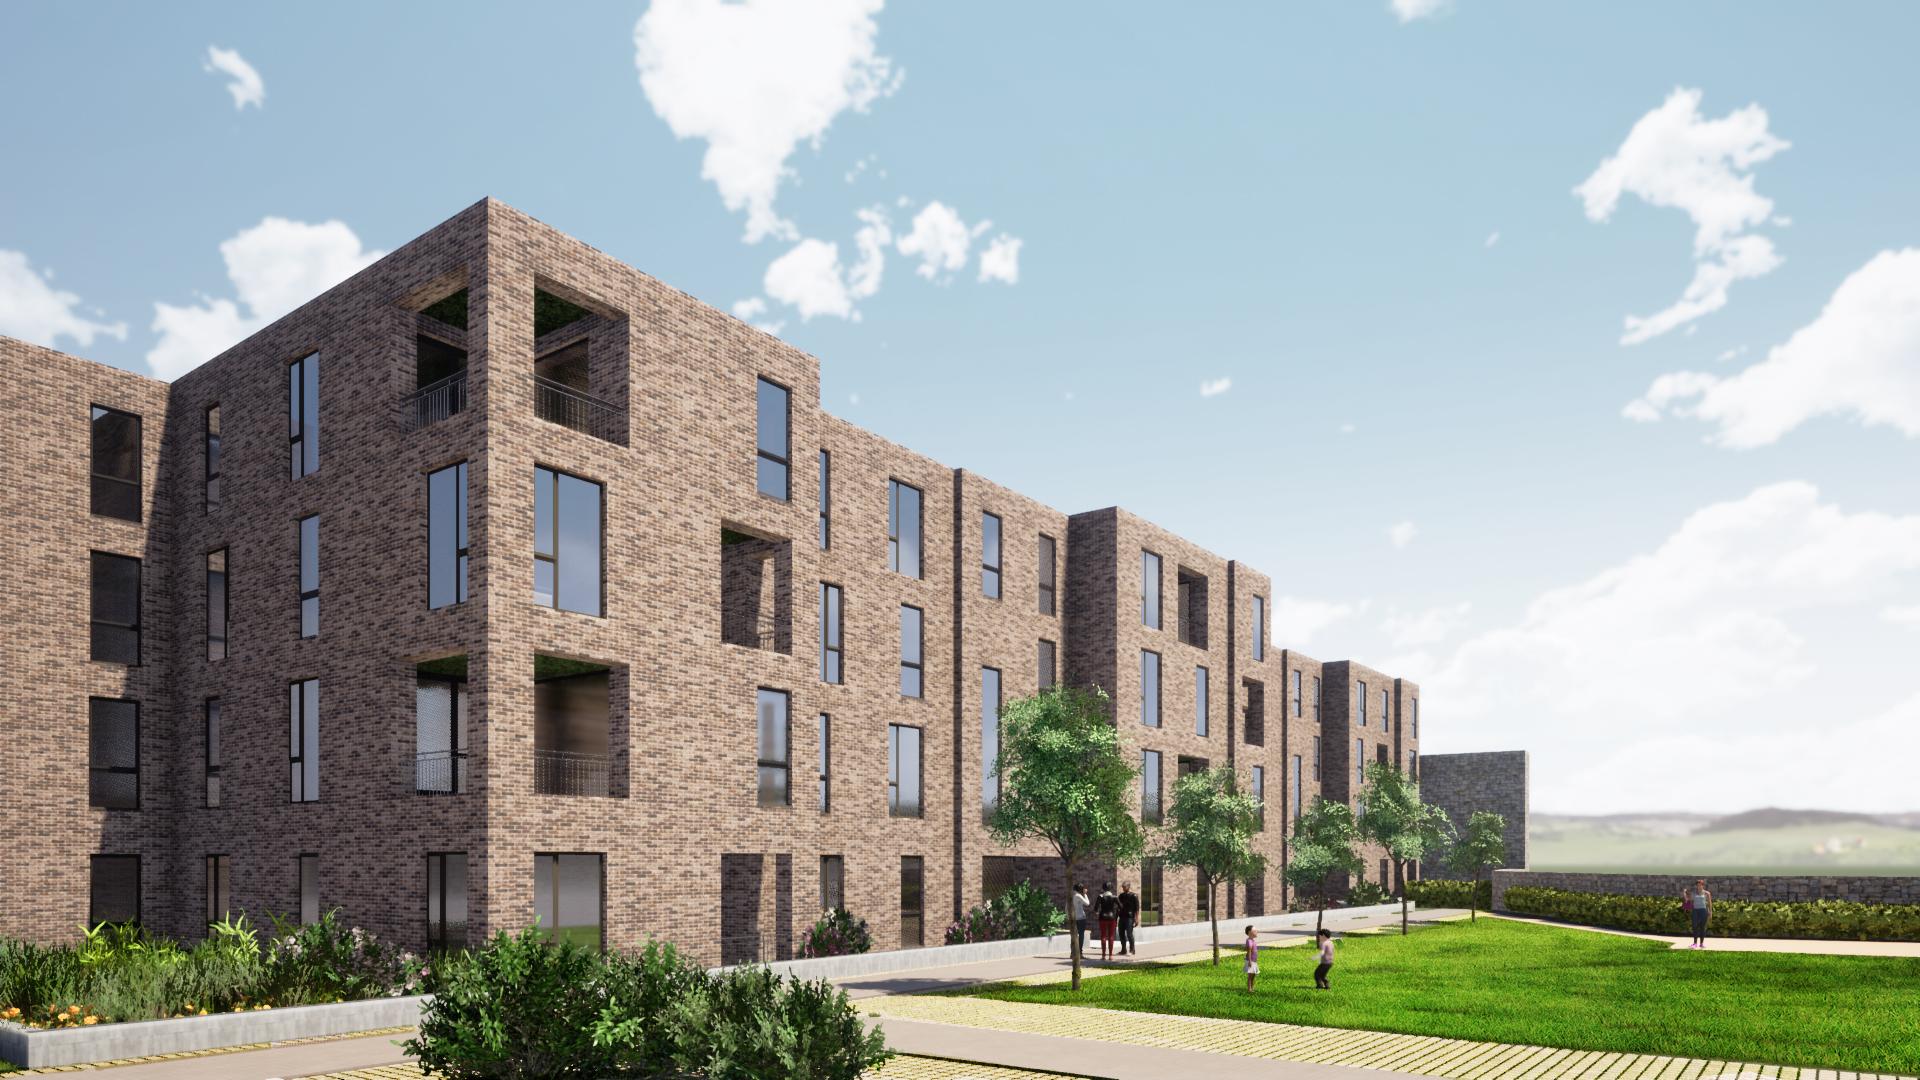 Skibbereen Planning Granted Architecture Ireland, Urban Design, Dublin/Cork/Kerry Architecture